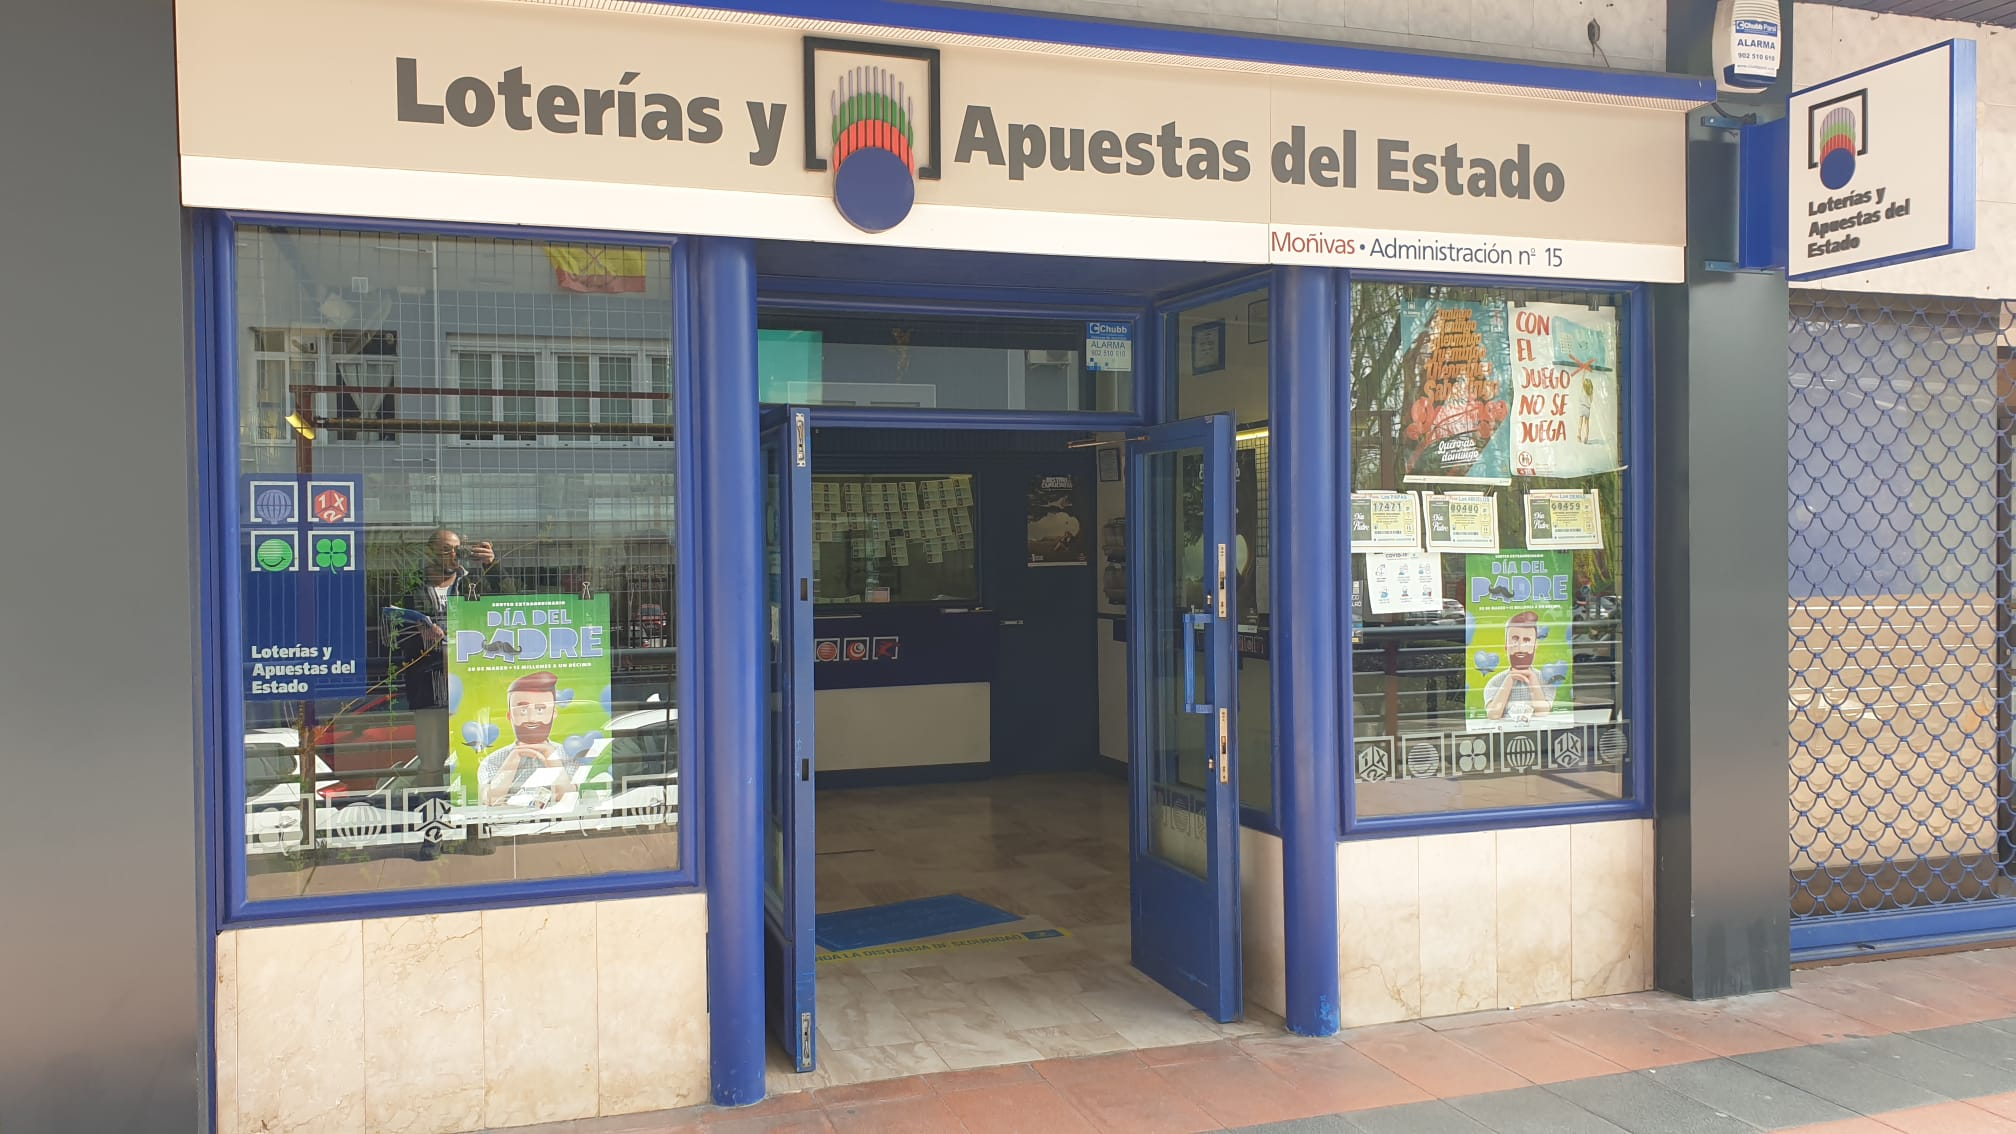 Administración de Lotería nº15